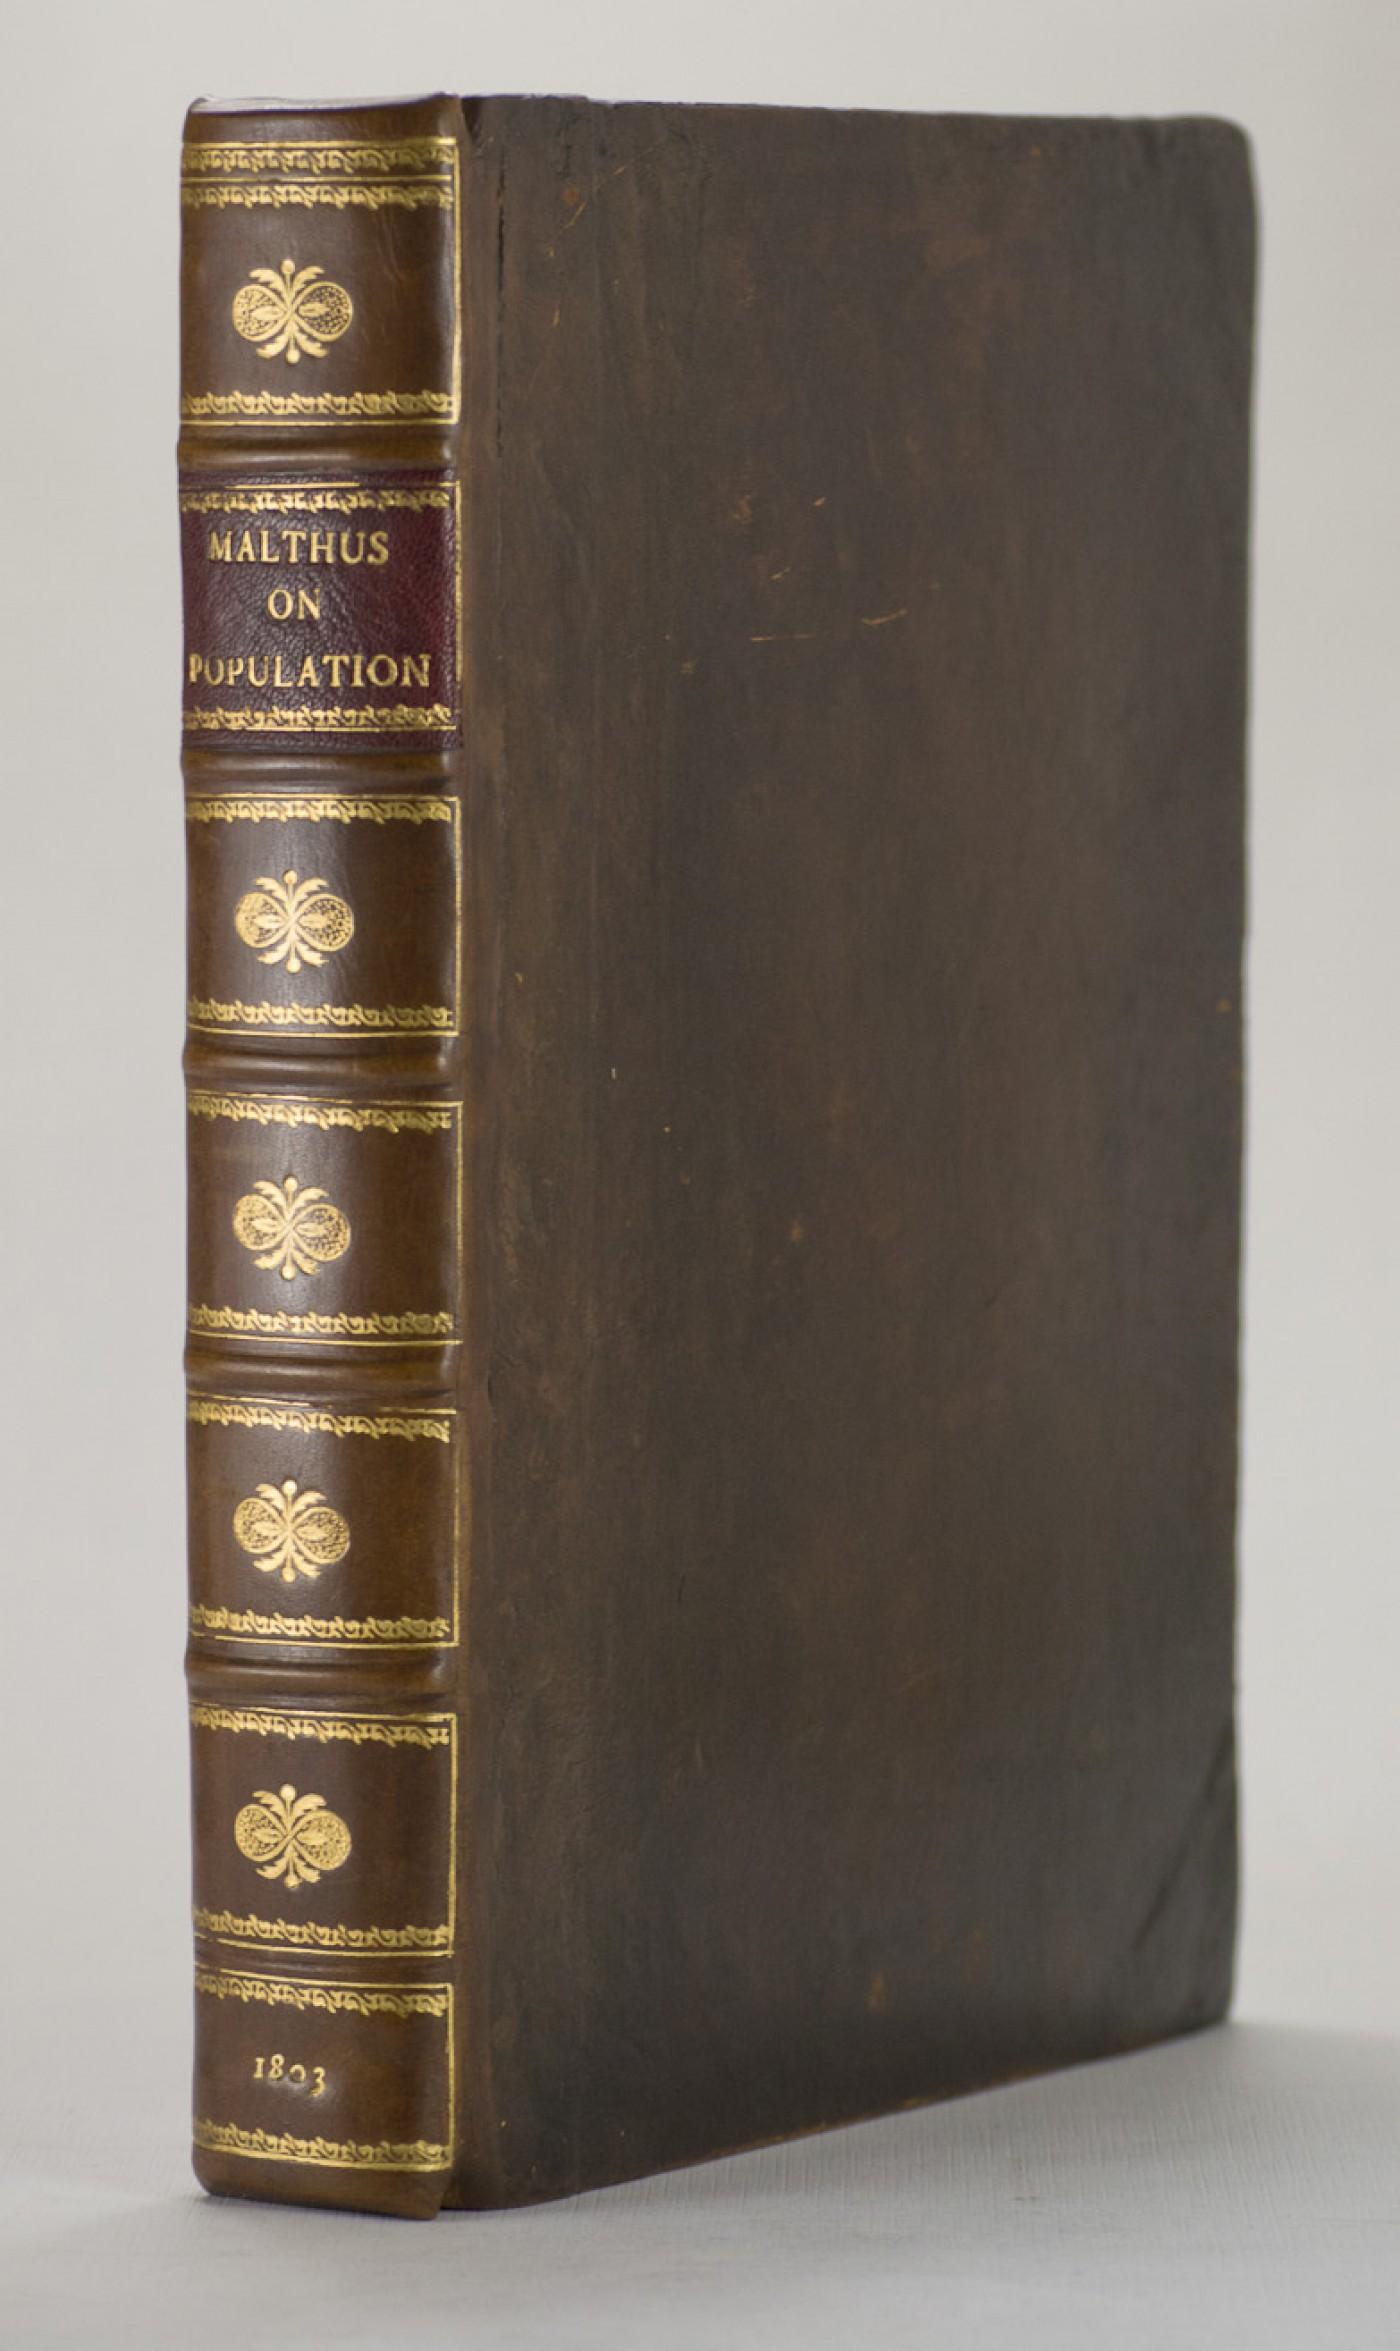 020 65276 1 Essay Example On The Principle Of Singular Population Malthus Sparknotes Thomas Main Idea 1400